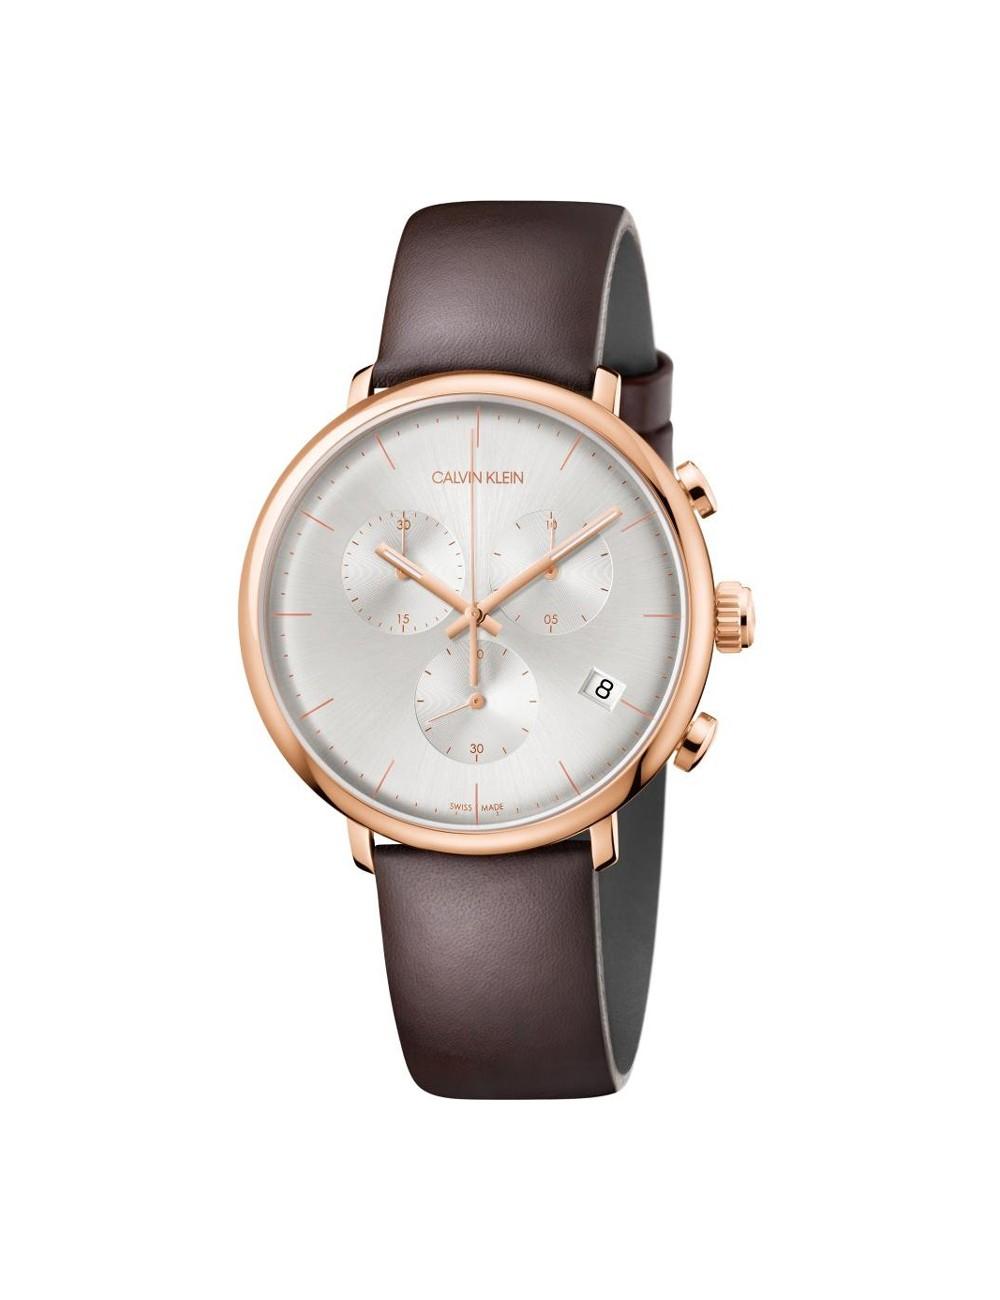 Pánske hodinky Chronograph Calvin Klein High Noon K8M276G6